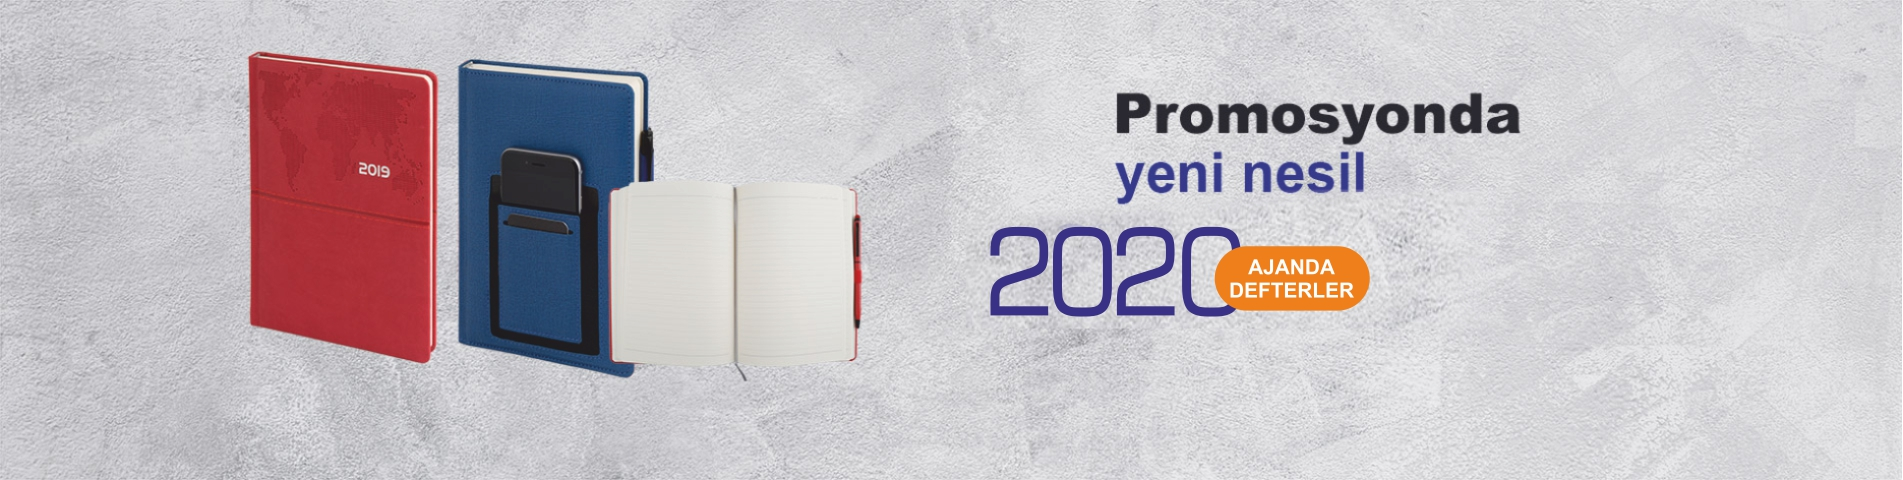 banner-2020-